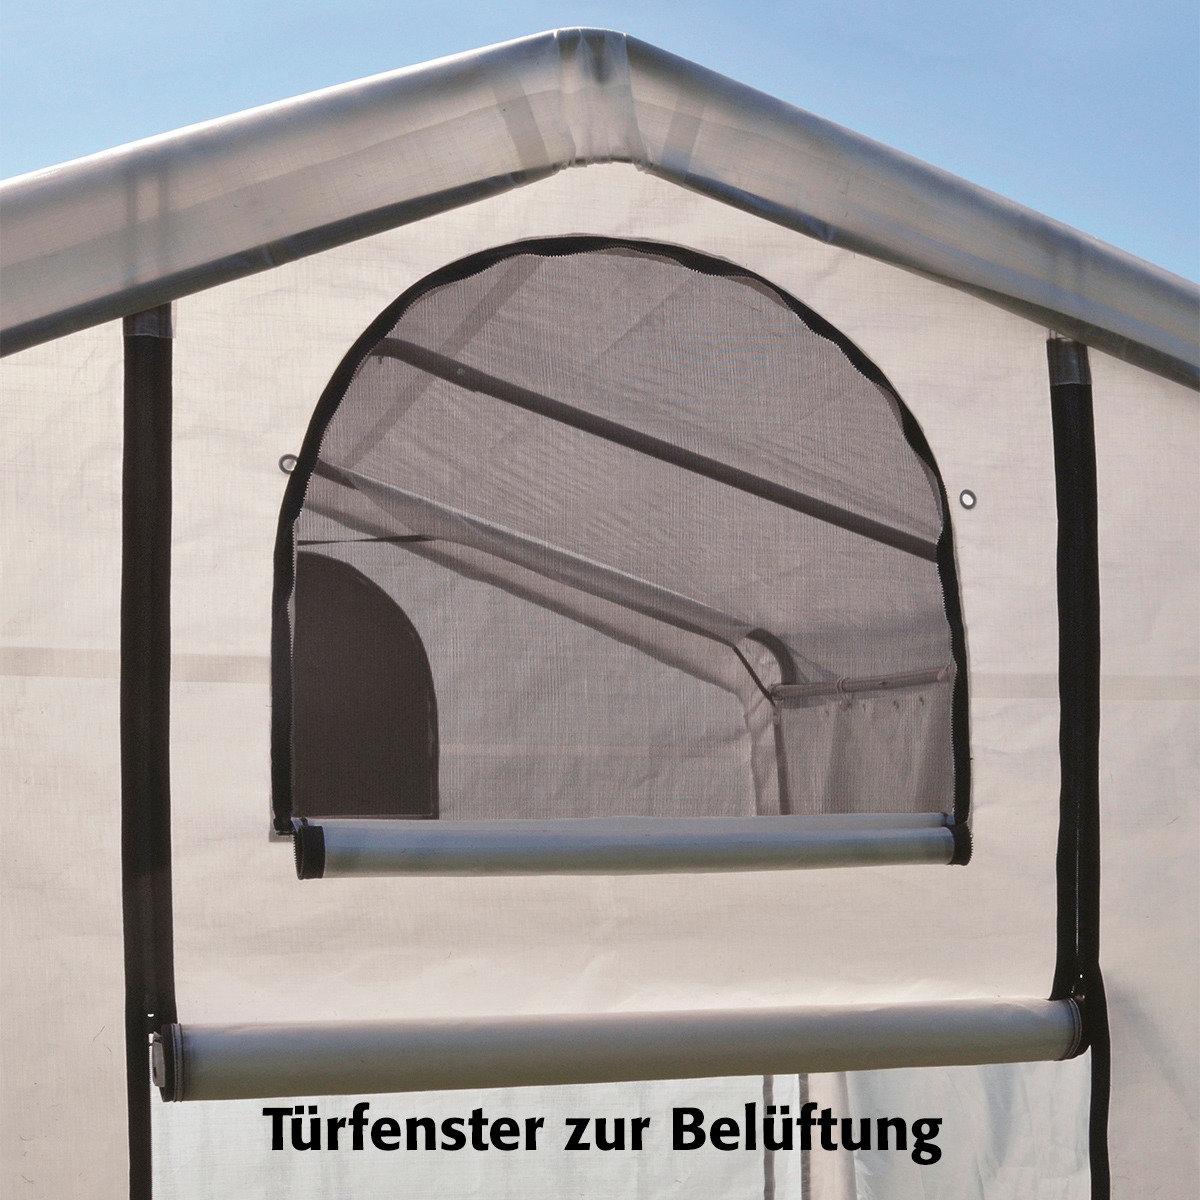 ShelterLogic Folien-Gewächshaus 3,24m² inkl. Sturmanker | #2